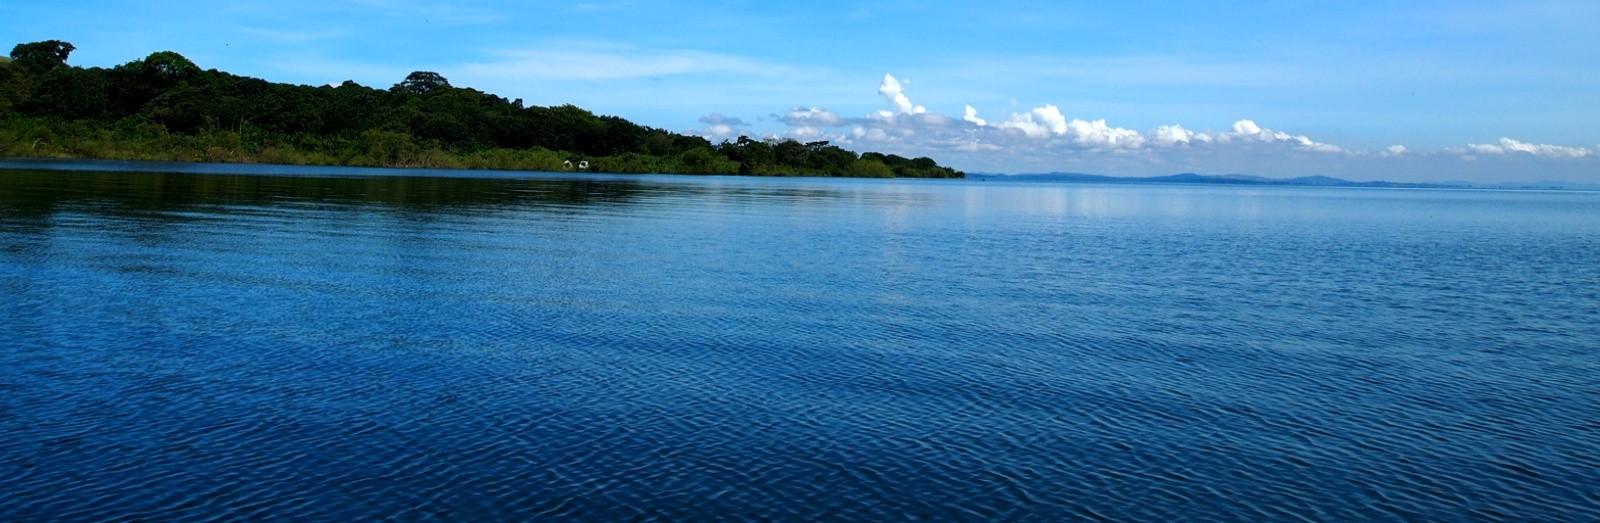 Pinapple Island Lake Victoria Uganda